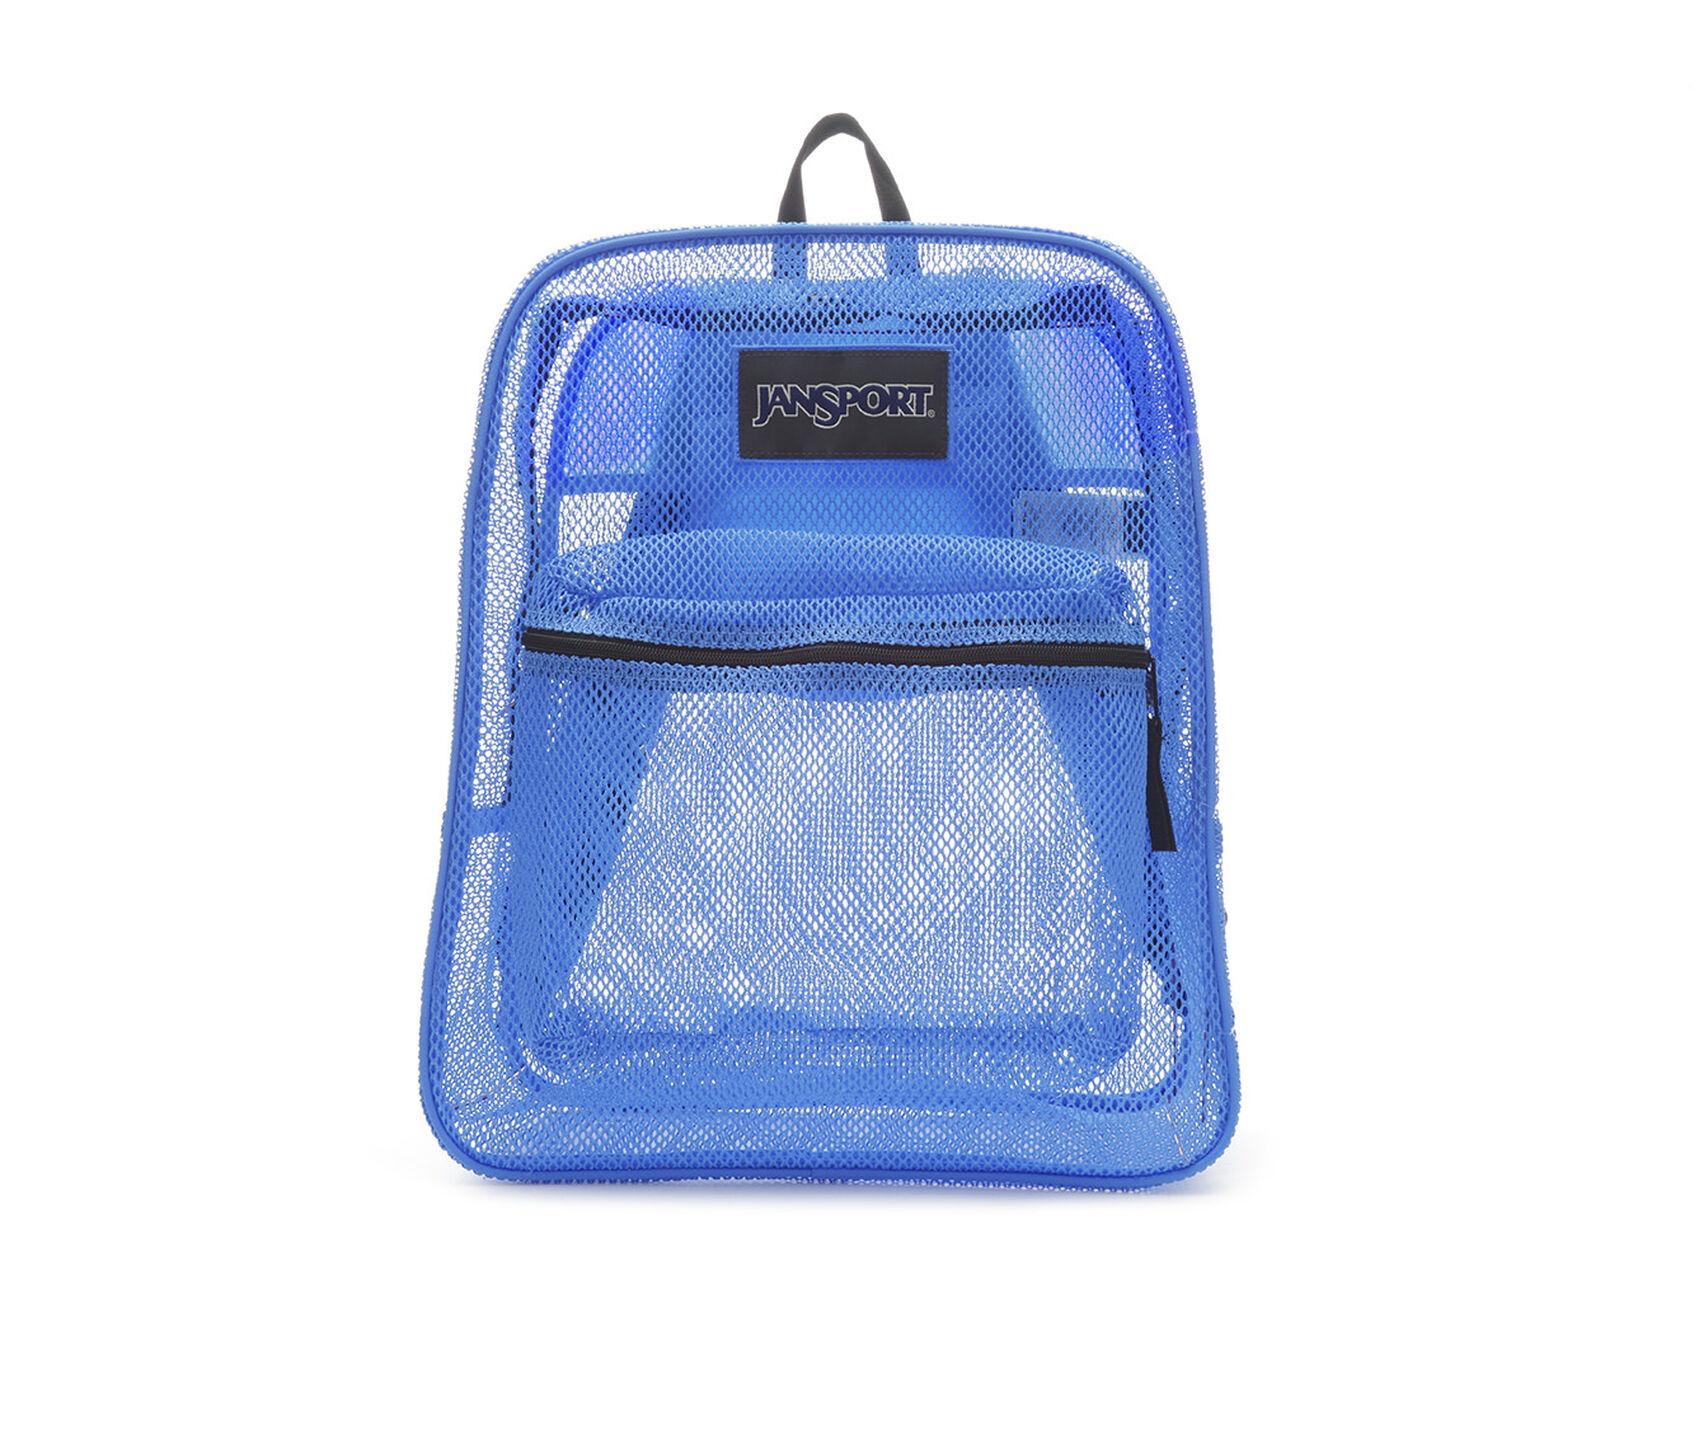 Jansport Sportbags Mesh Backpack